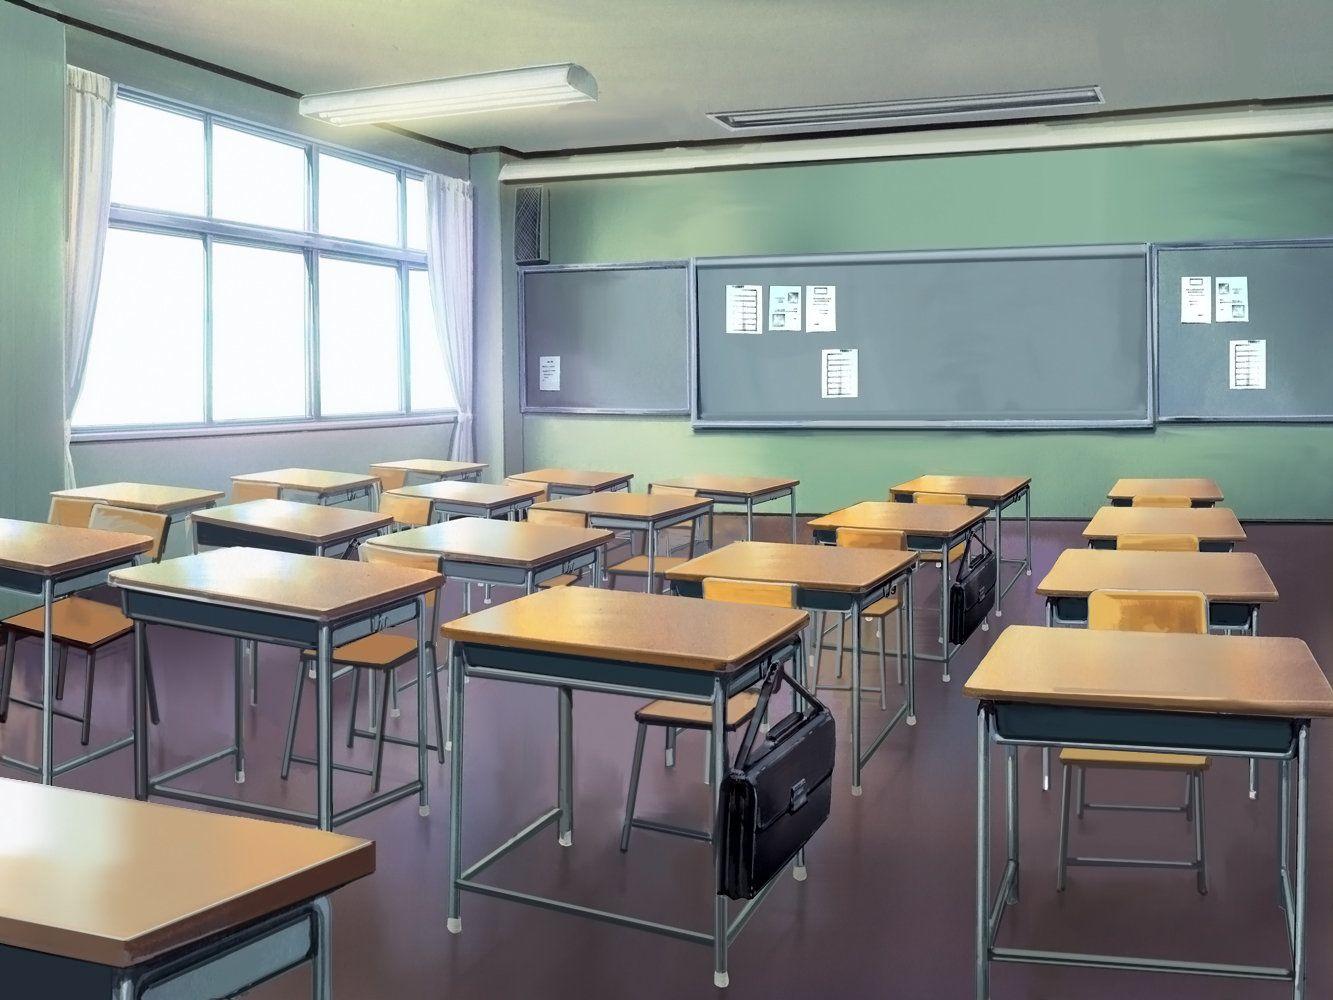 Pin by Freak on classroom in 2019 Anime scenery